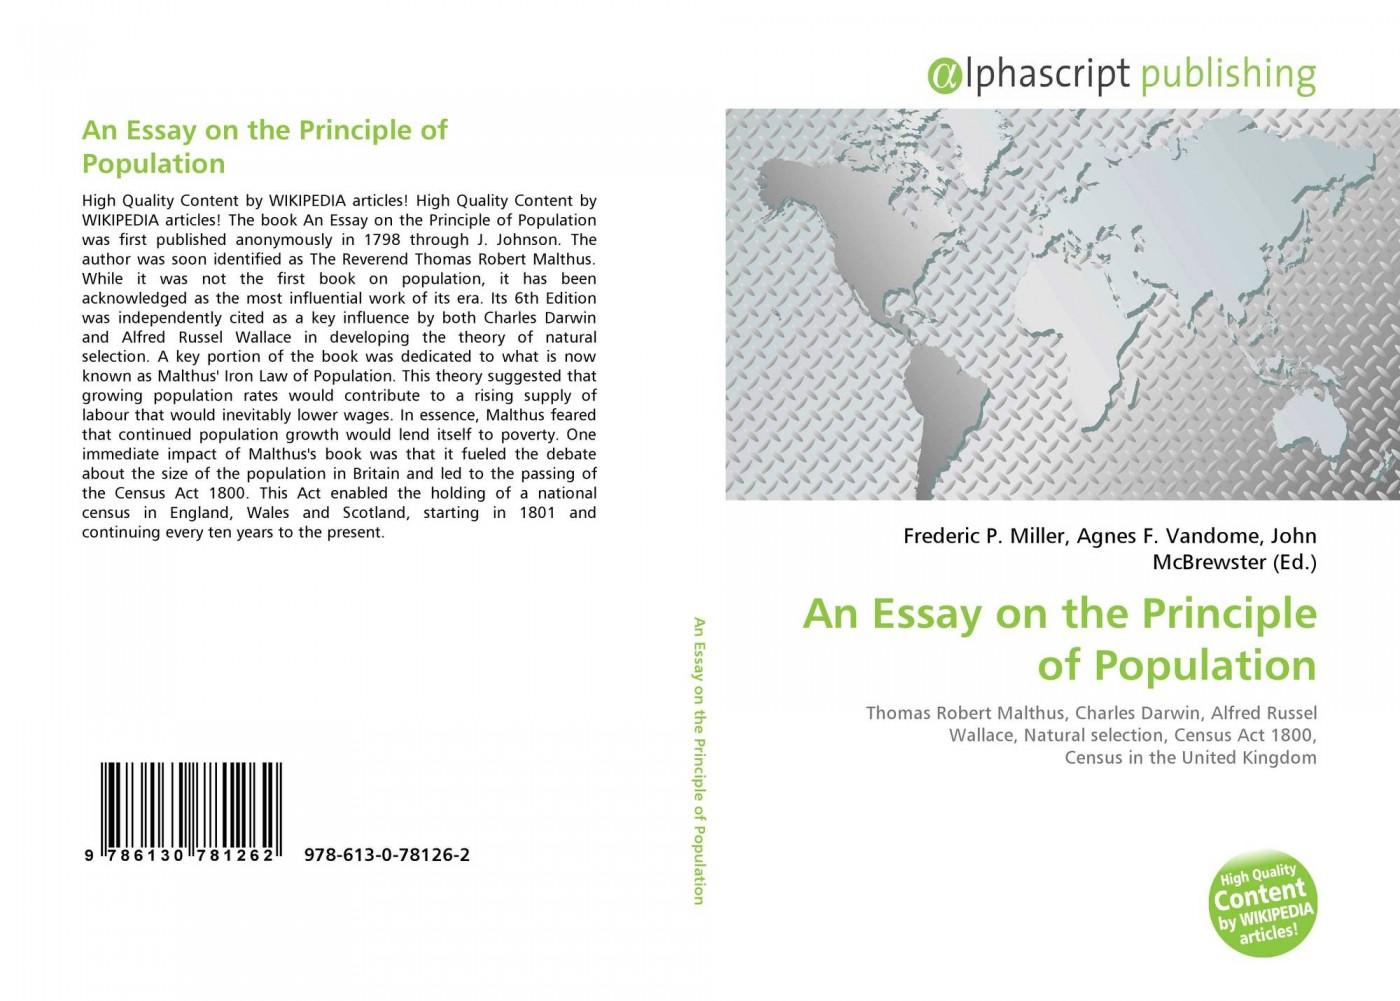 022 Essay On The Principle Of Population Example Singular Malthus Sparknotes Thomas Main Idea 1400